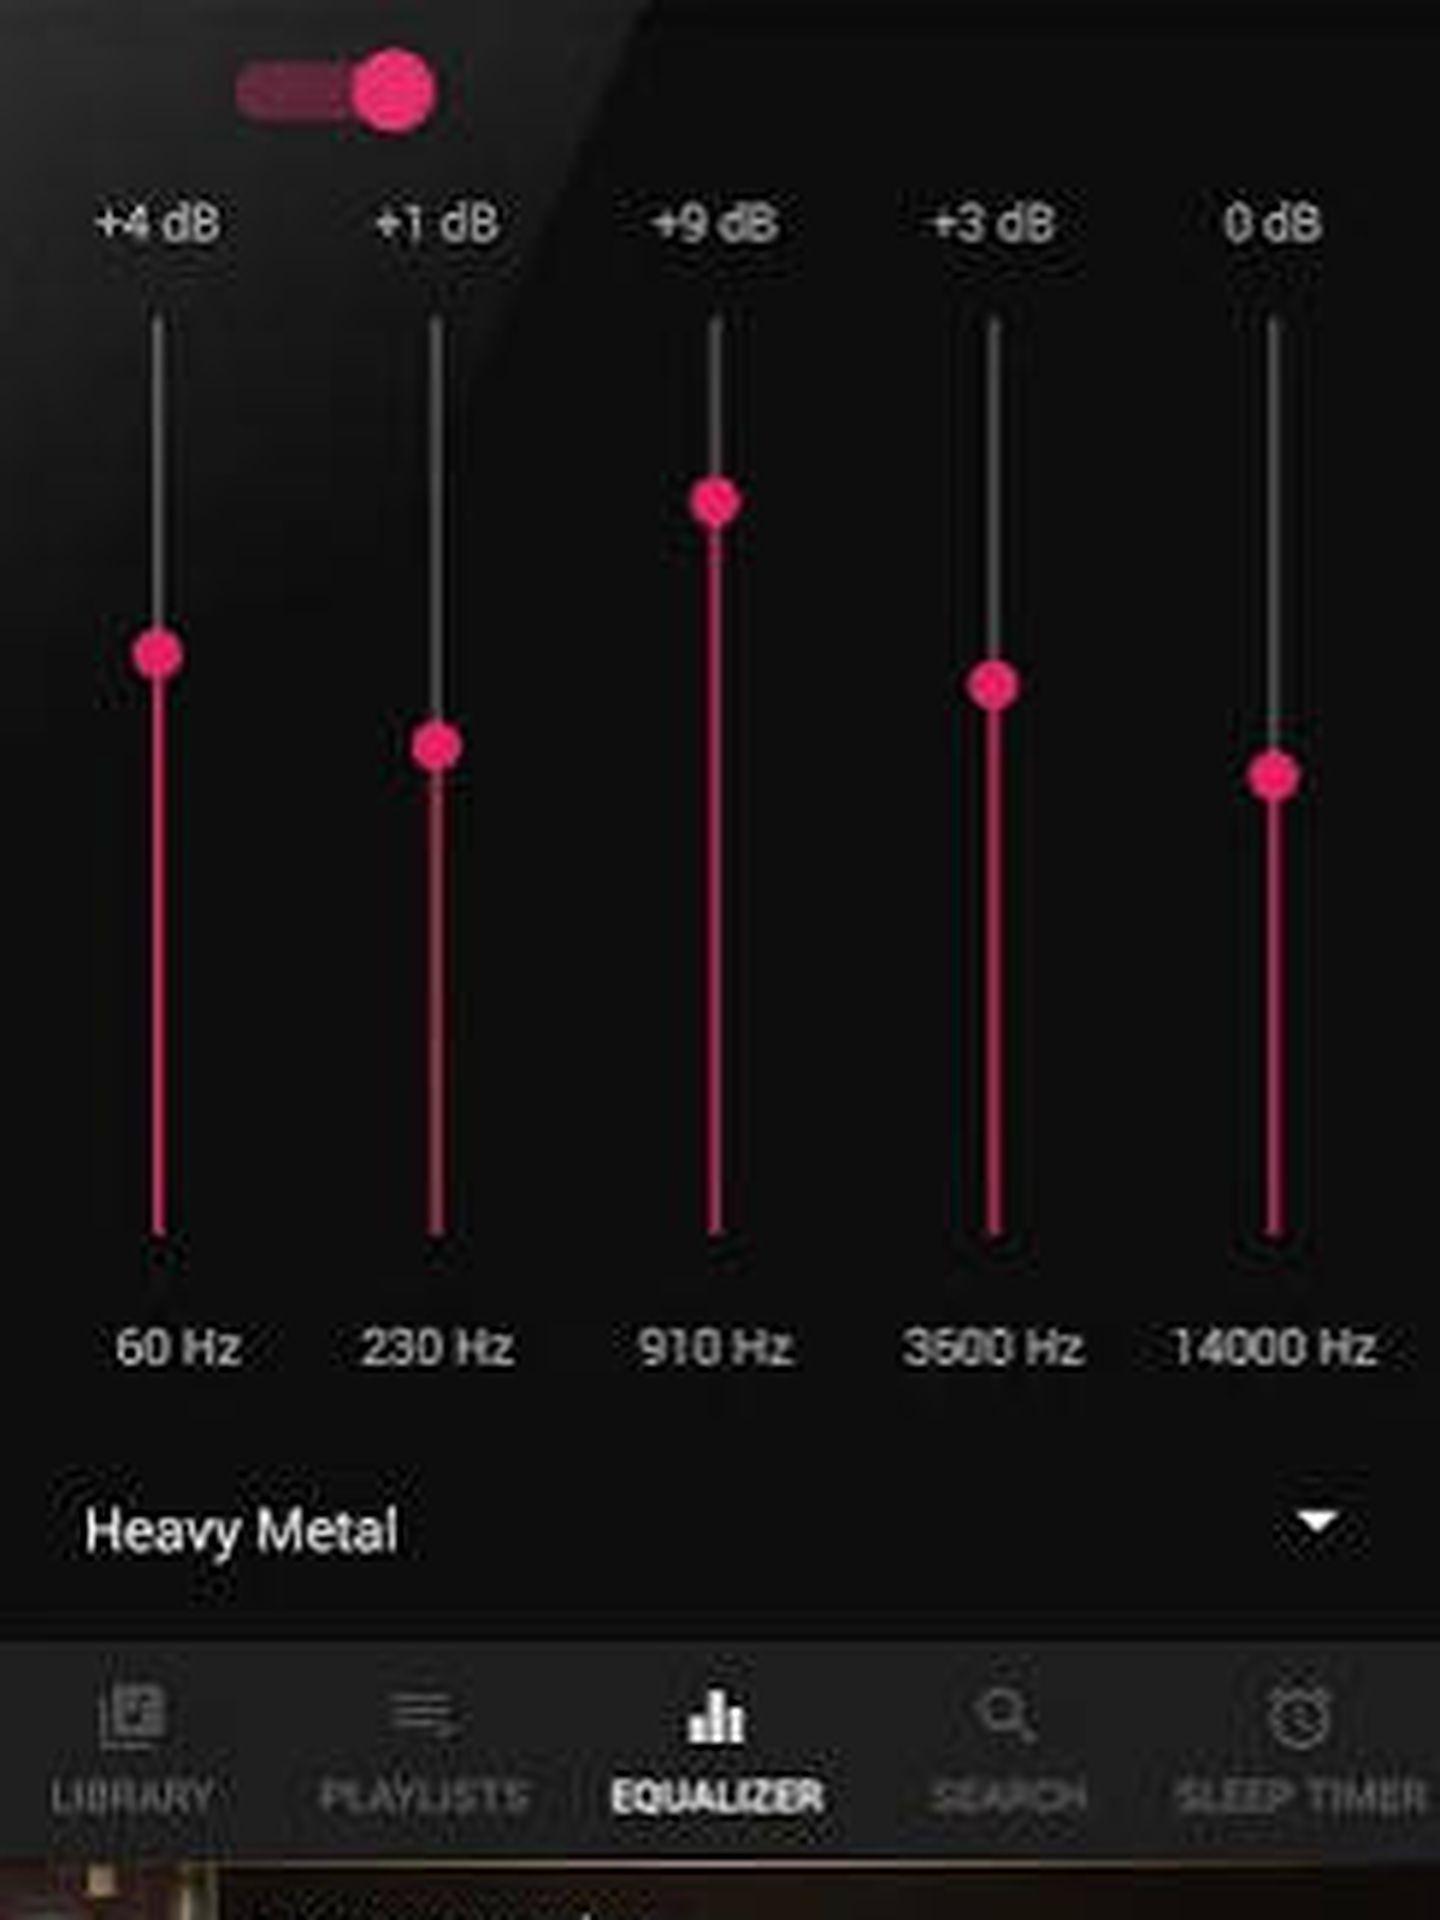 Imagen del ecualizador BlackPlayer Music Player. (Imagen: Play Store)